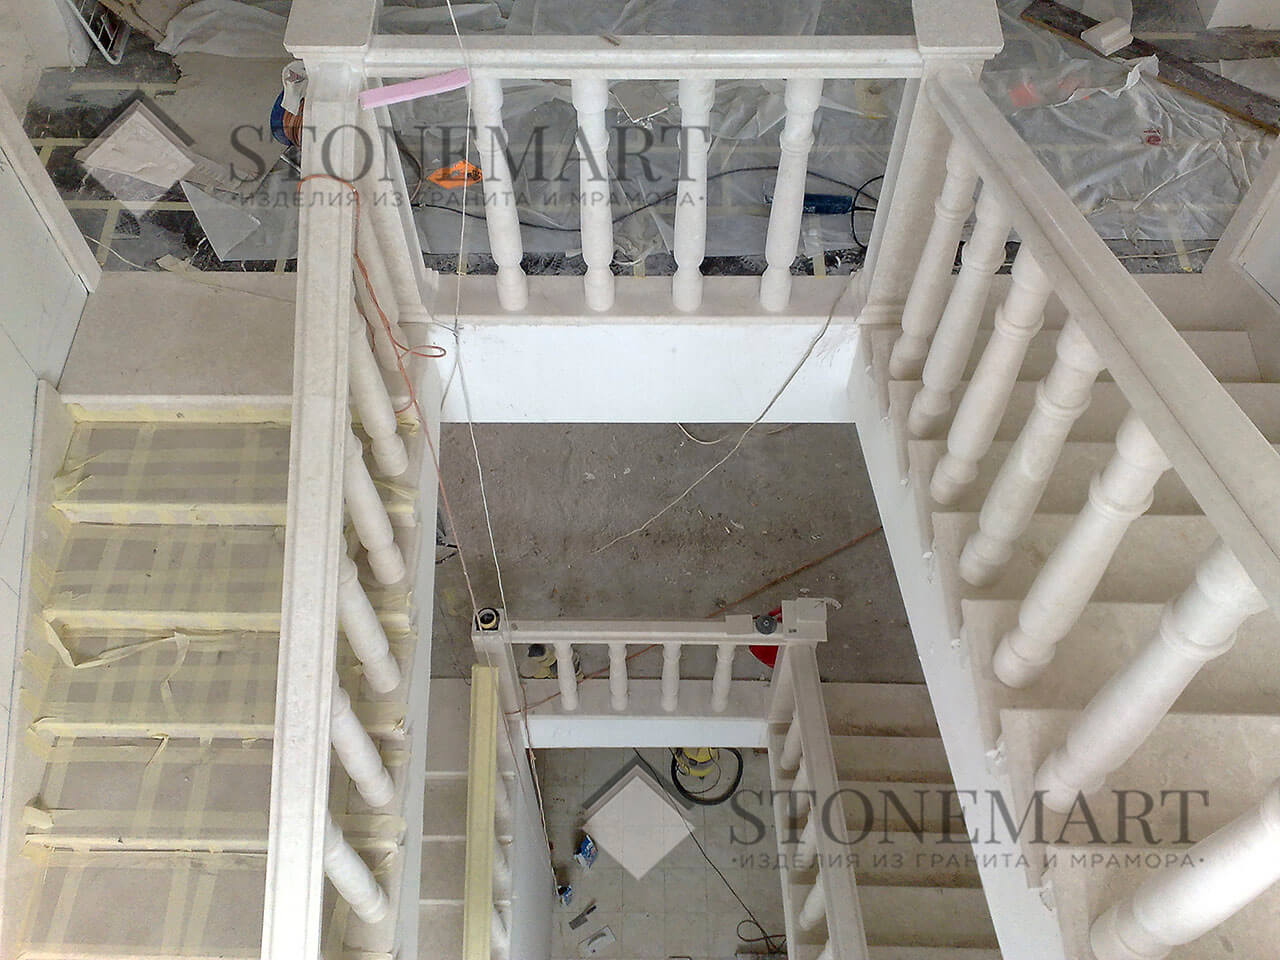 Лестница из мрамора изготовлена и смонтирована мастерами компании Stonemart